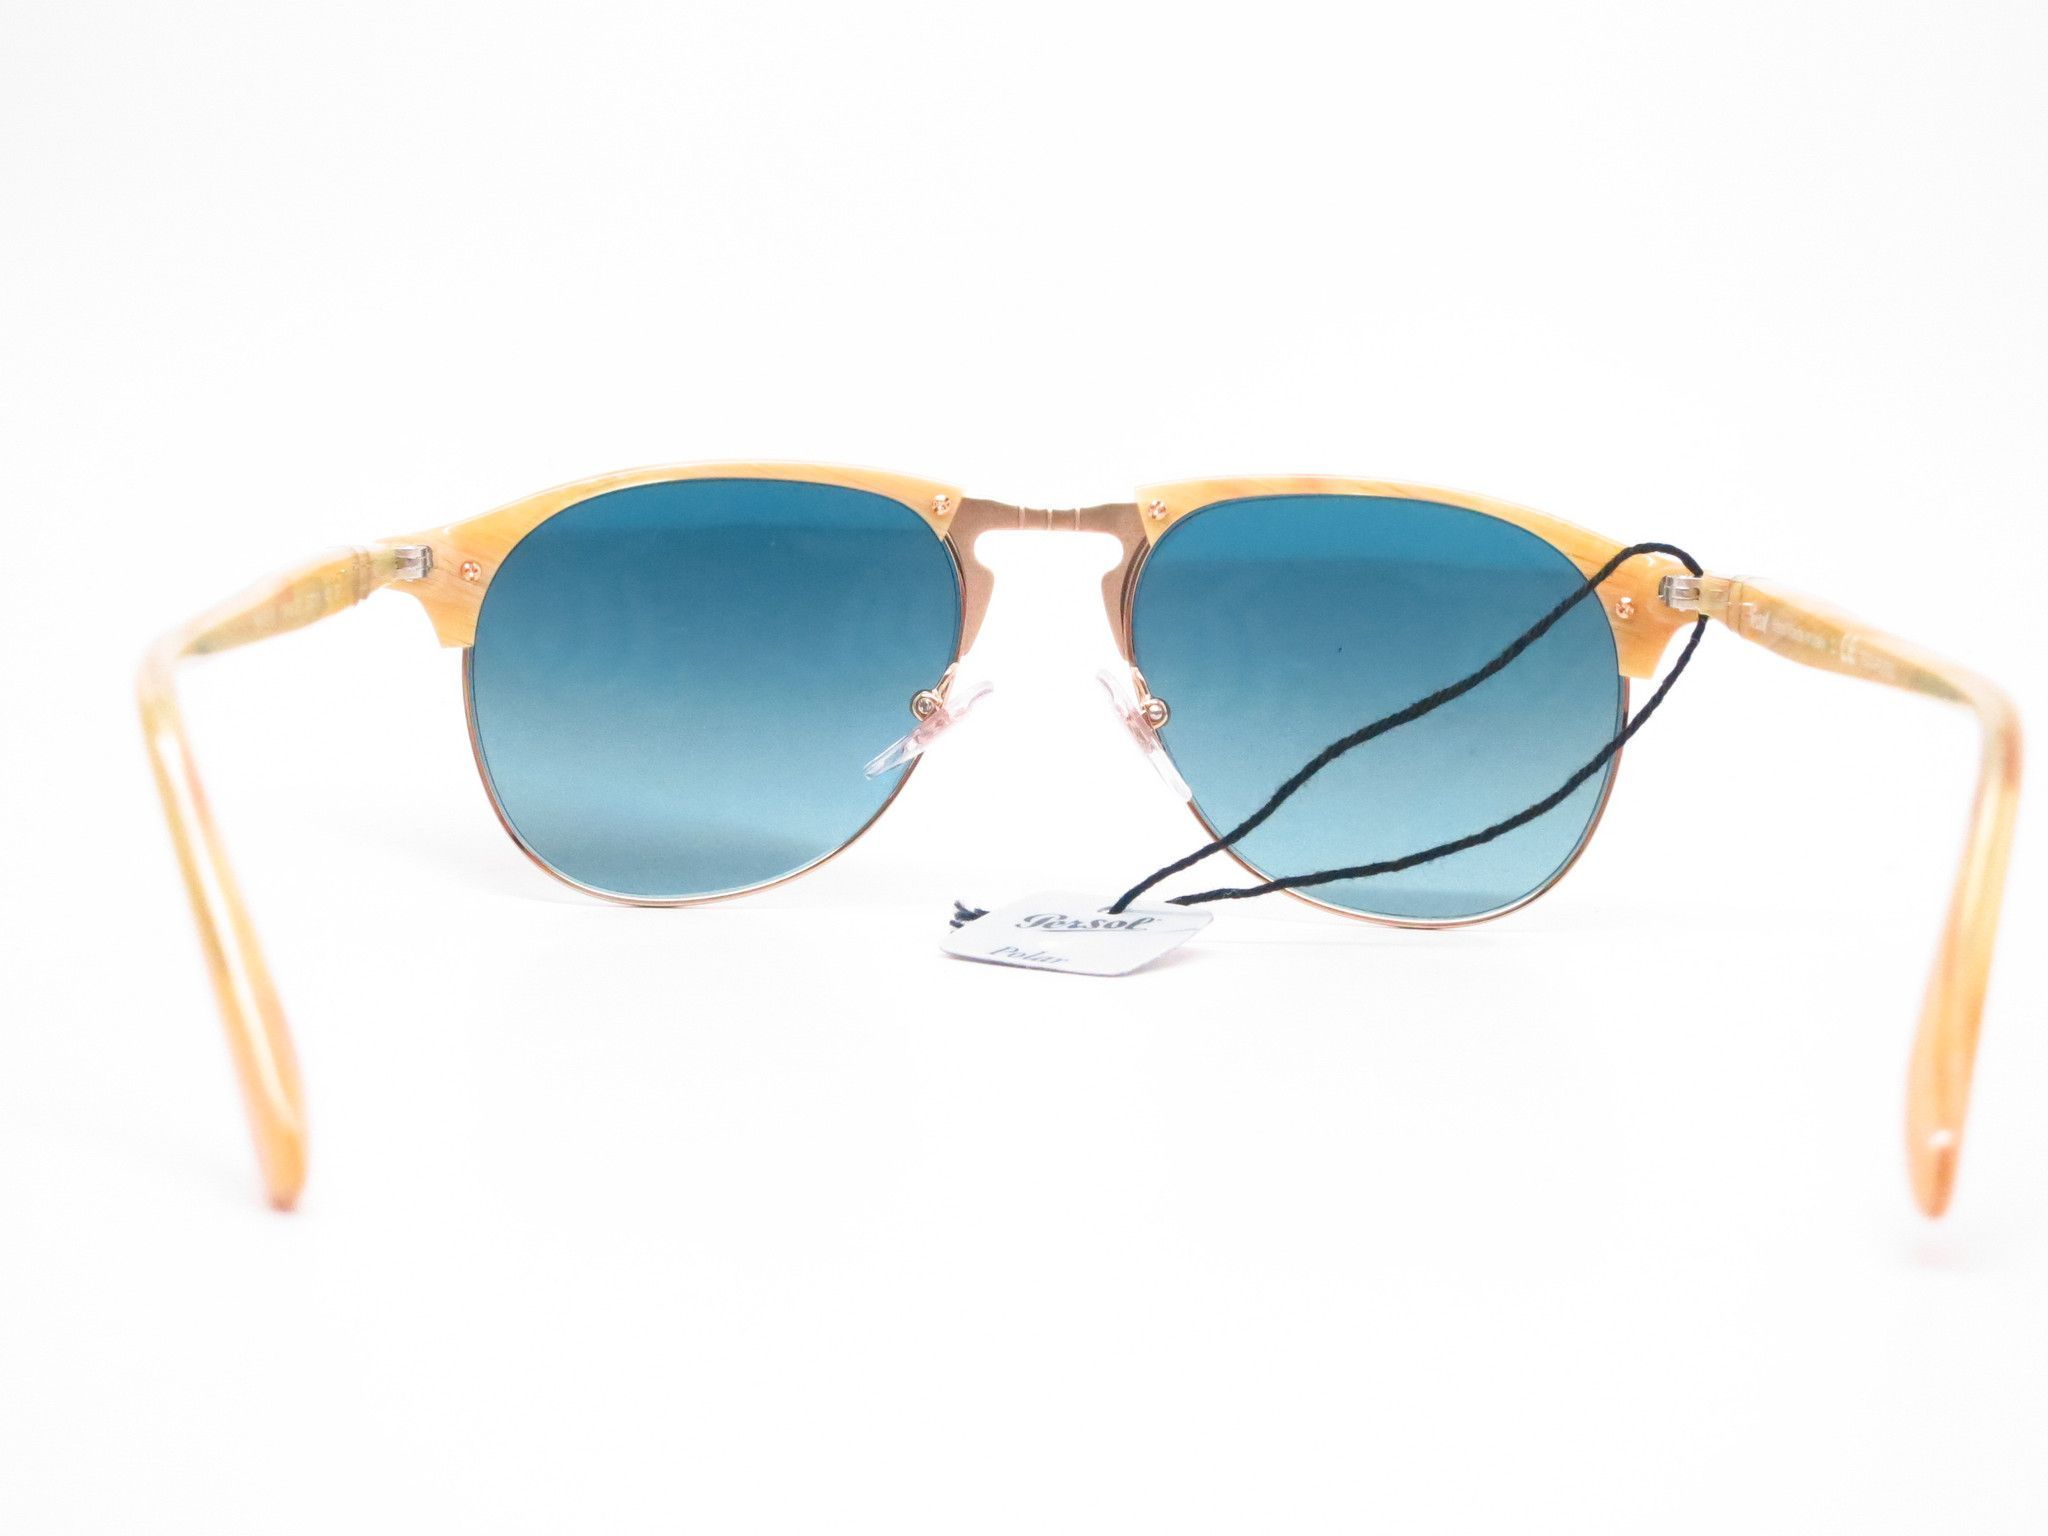 c421dce635 Persol PO 8649S 1046 S3 Light Horn Polarized Sunglasses